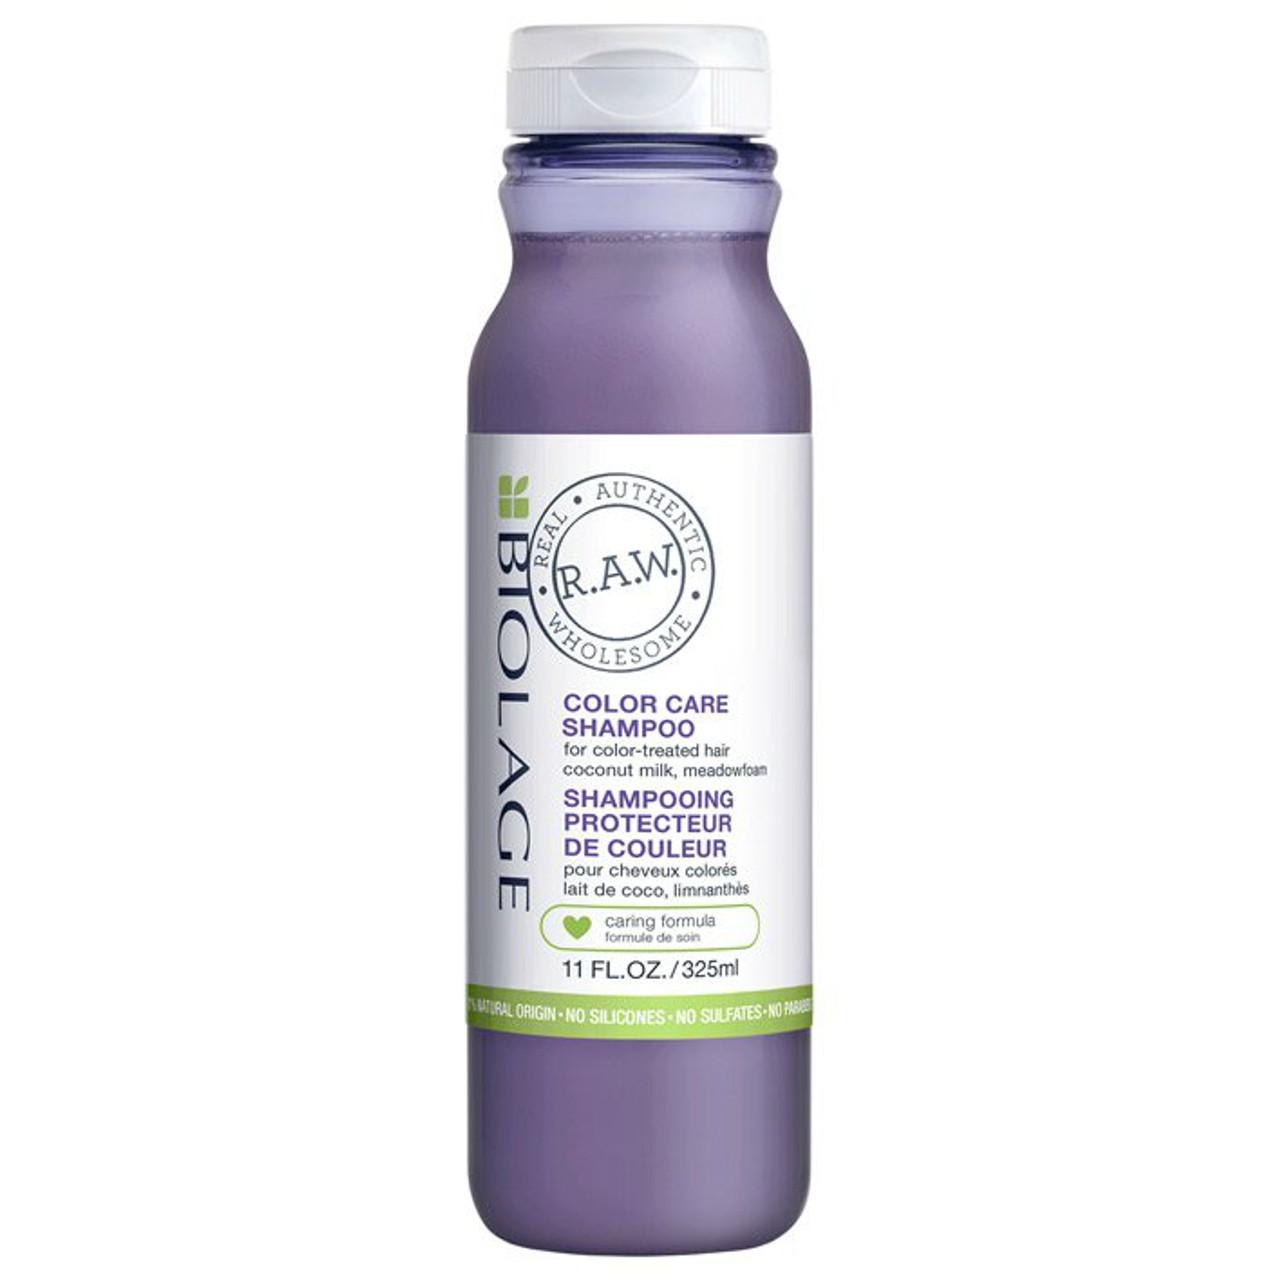 Biolage RAW Color Care Shampoo 11 oz